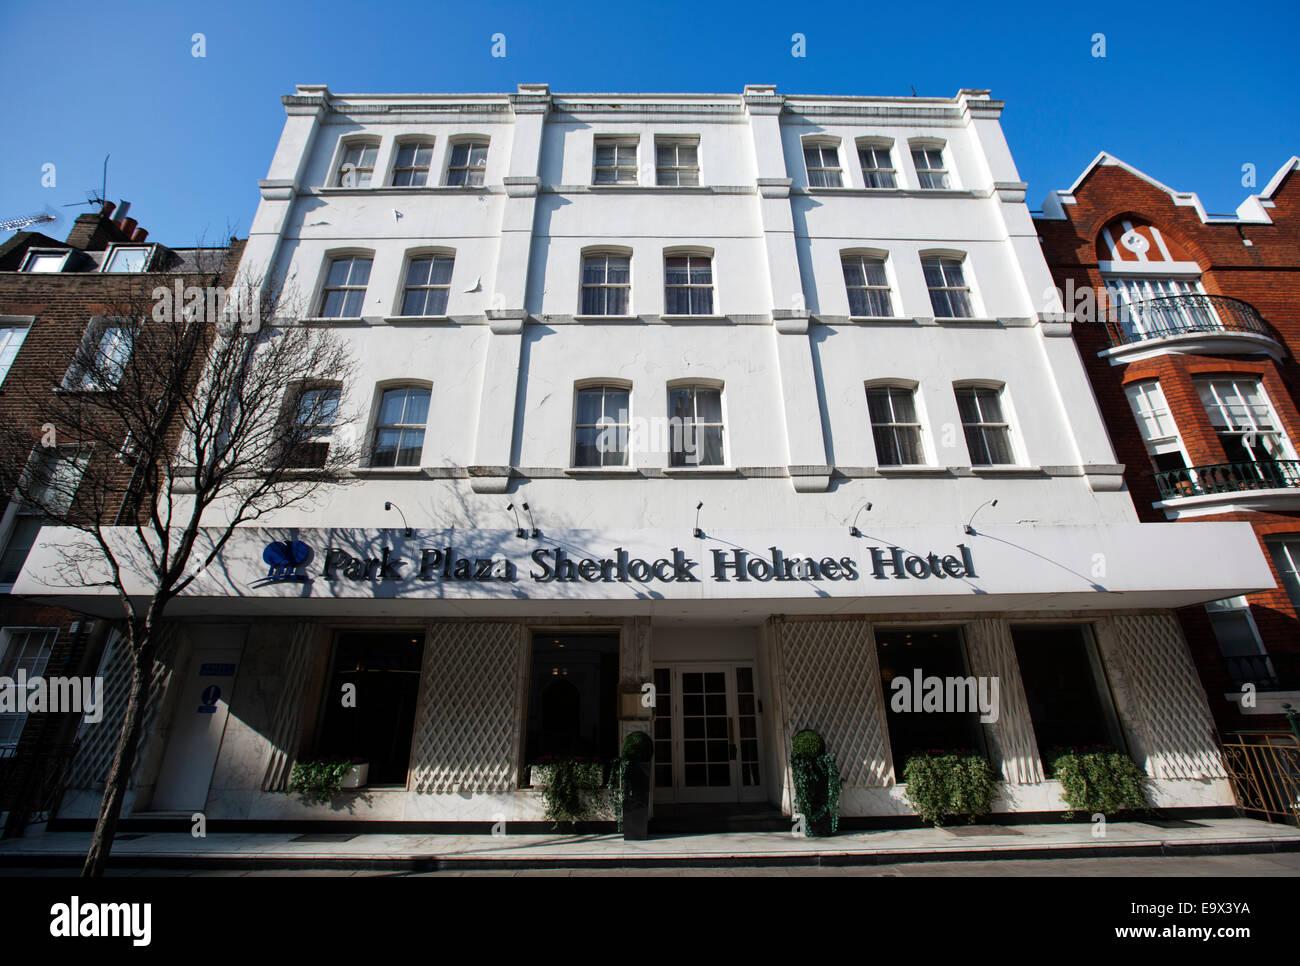 Park Plaza Sherlock Holmes Hotel Baker Street